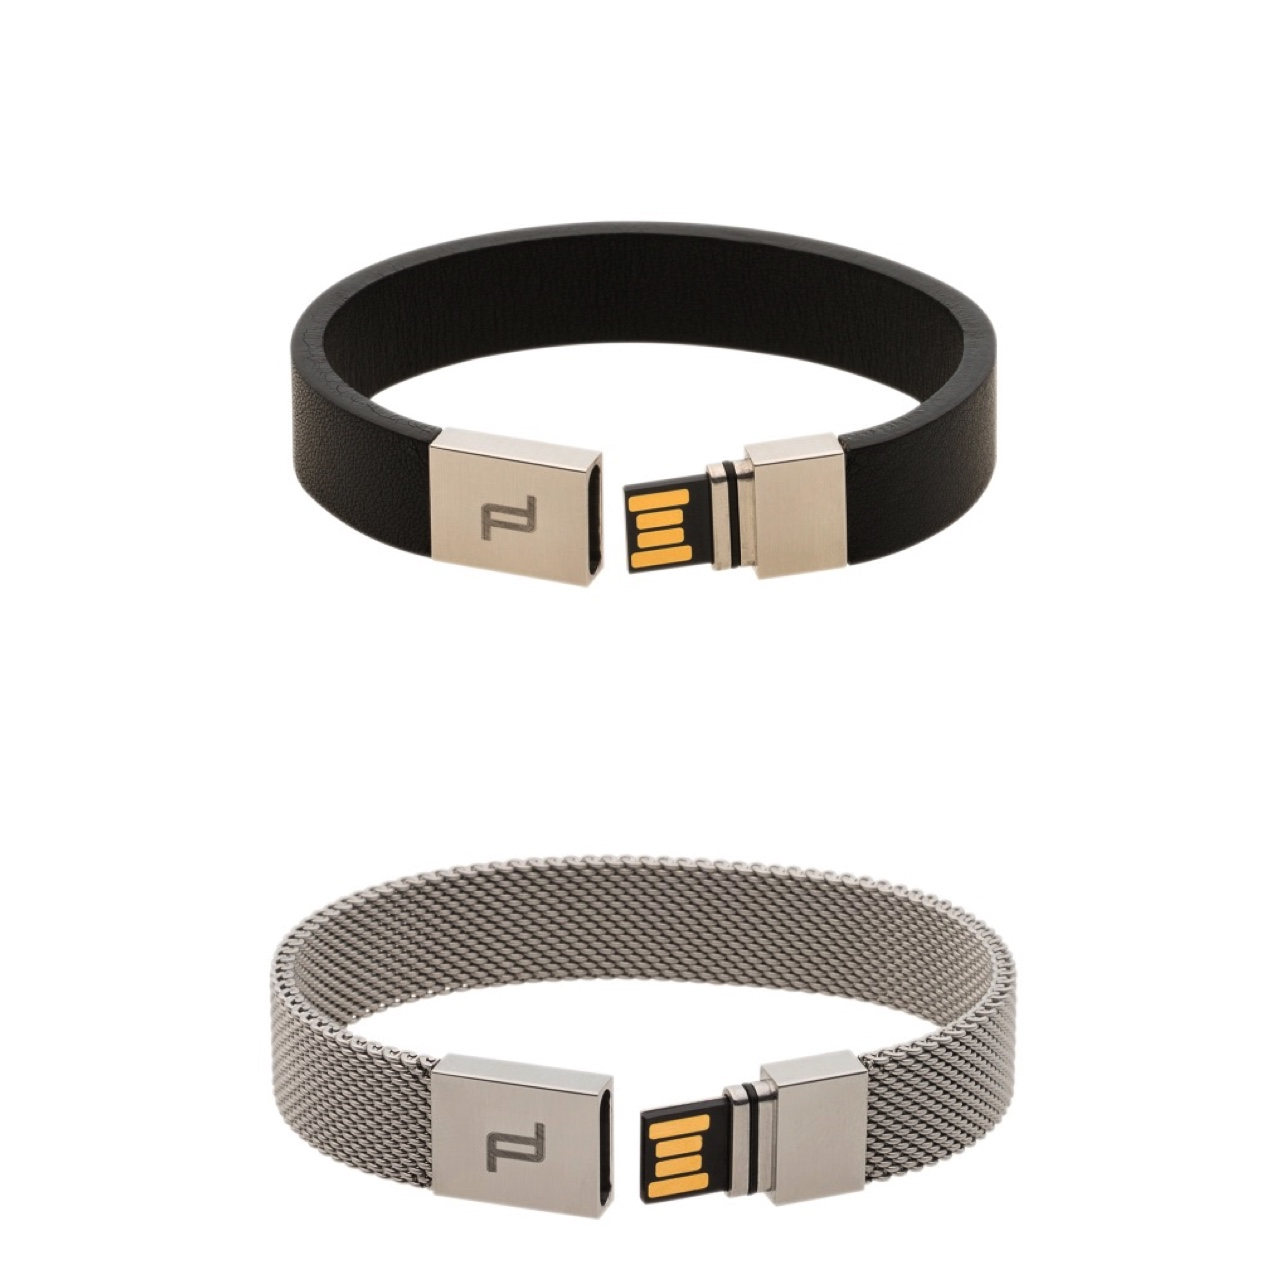 Porsche Design Bracelet USB Memory | Christmas Gift Idea